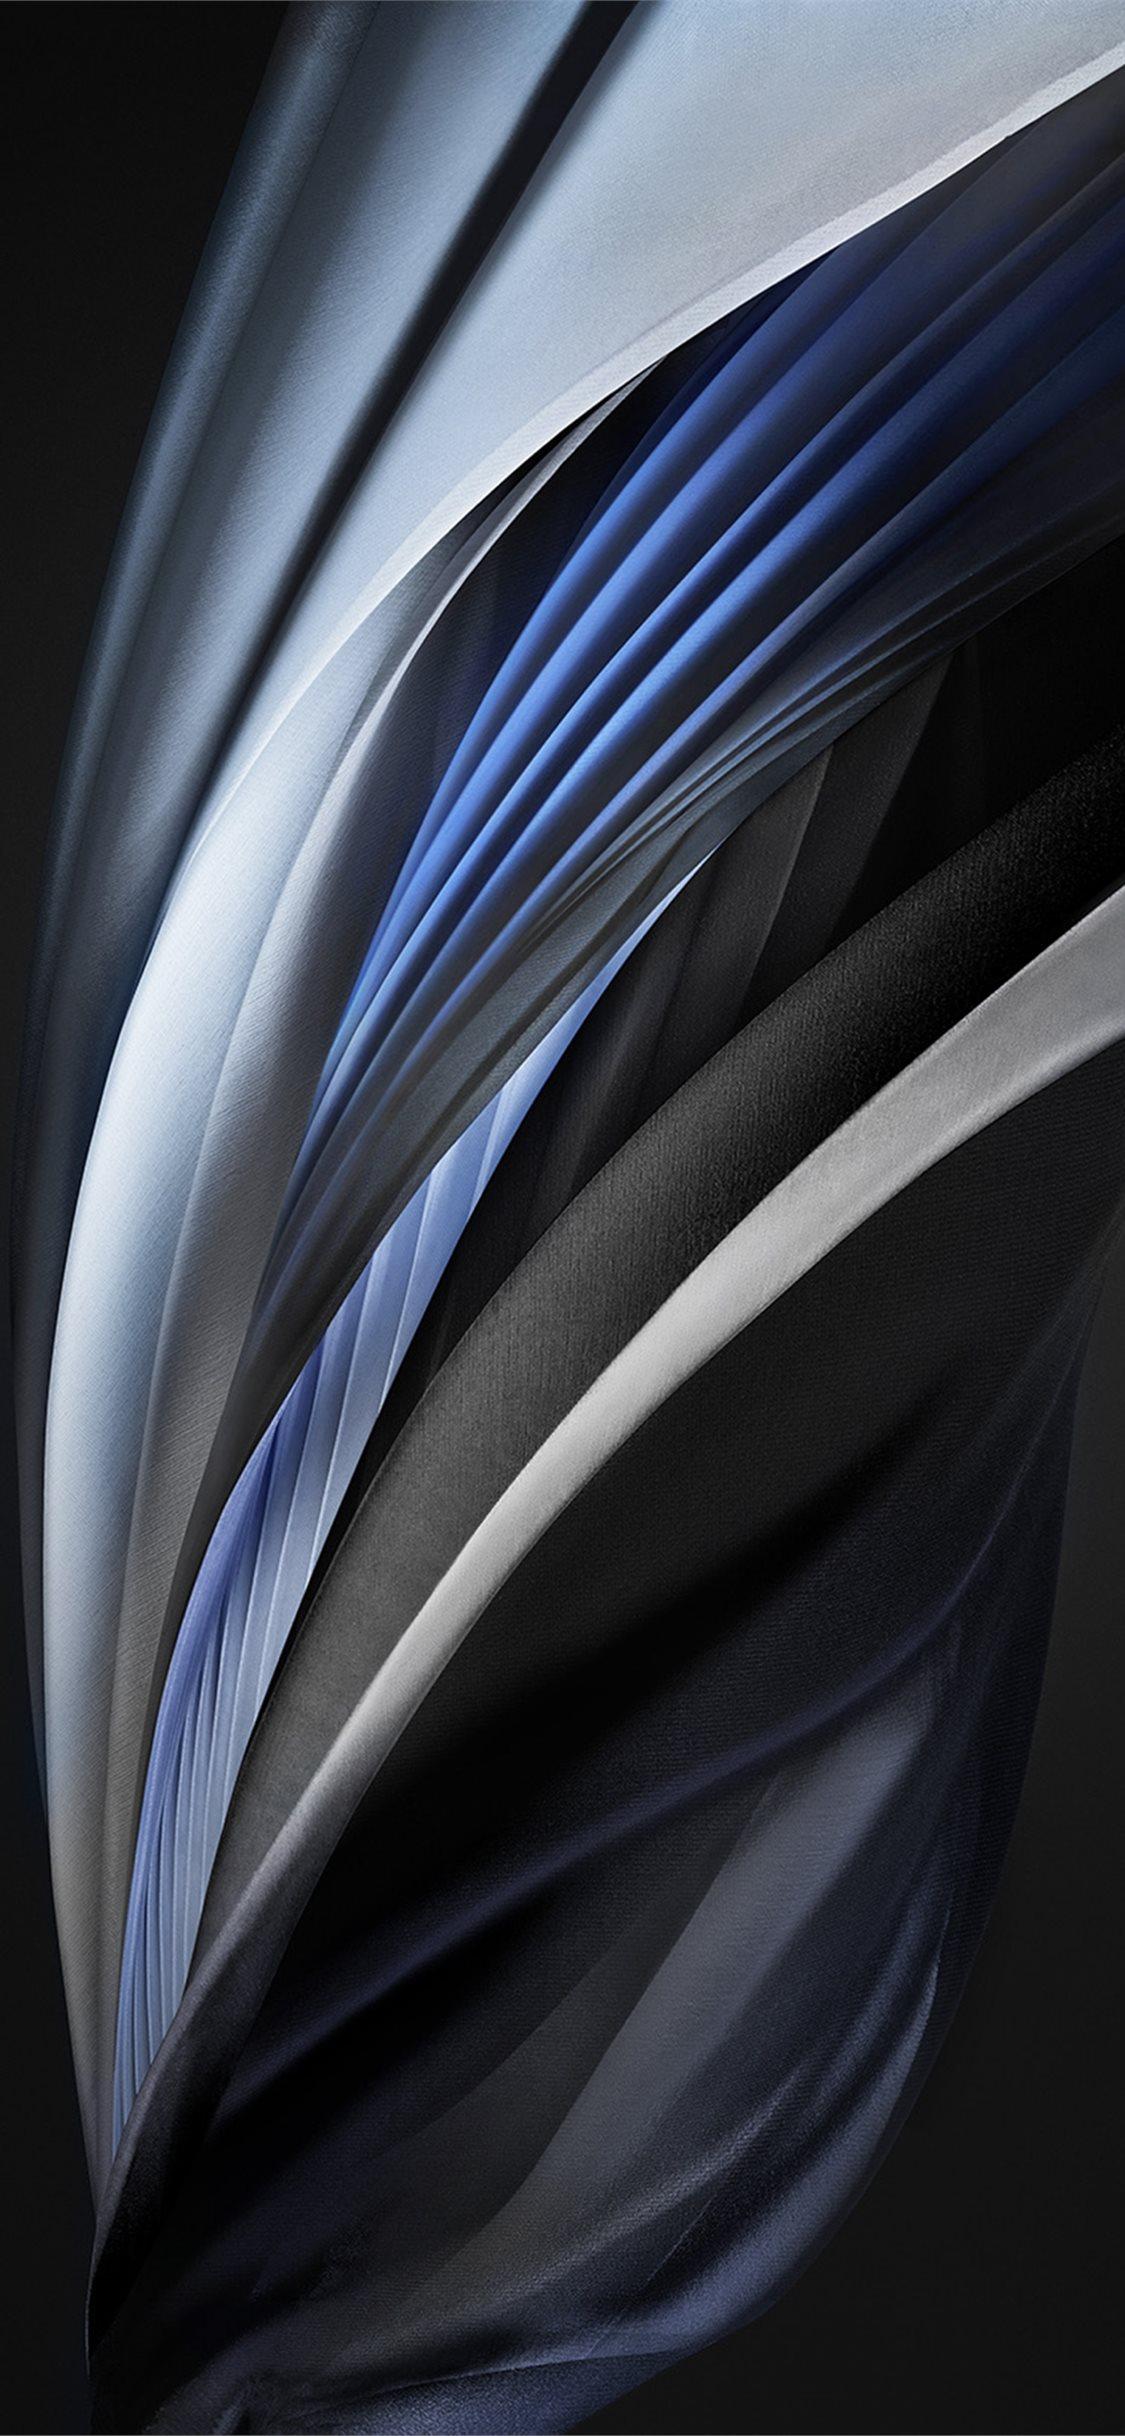 Iphone Se 2020 Stock Wallpaper Silk Silver Mono Light Iphone X